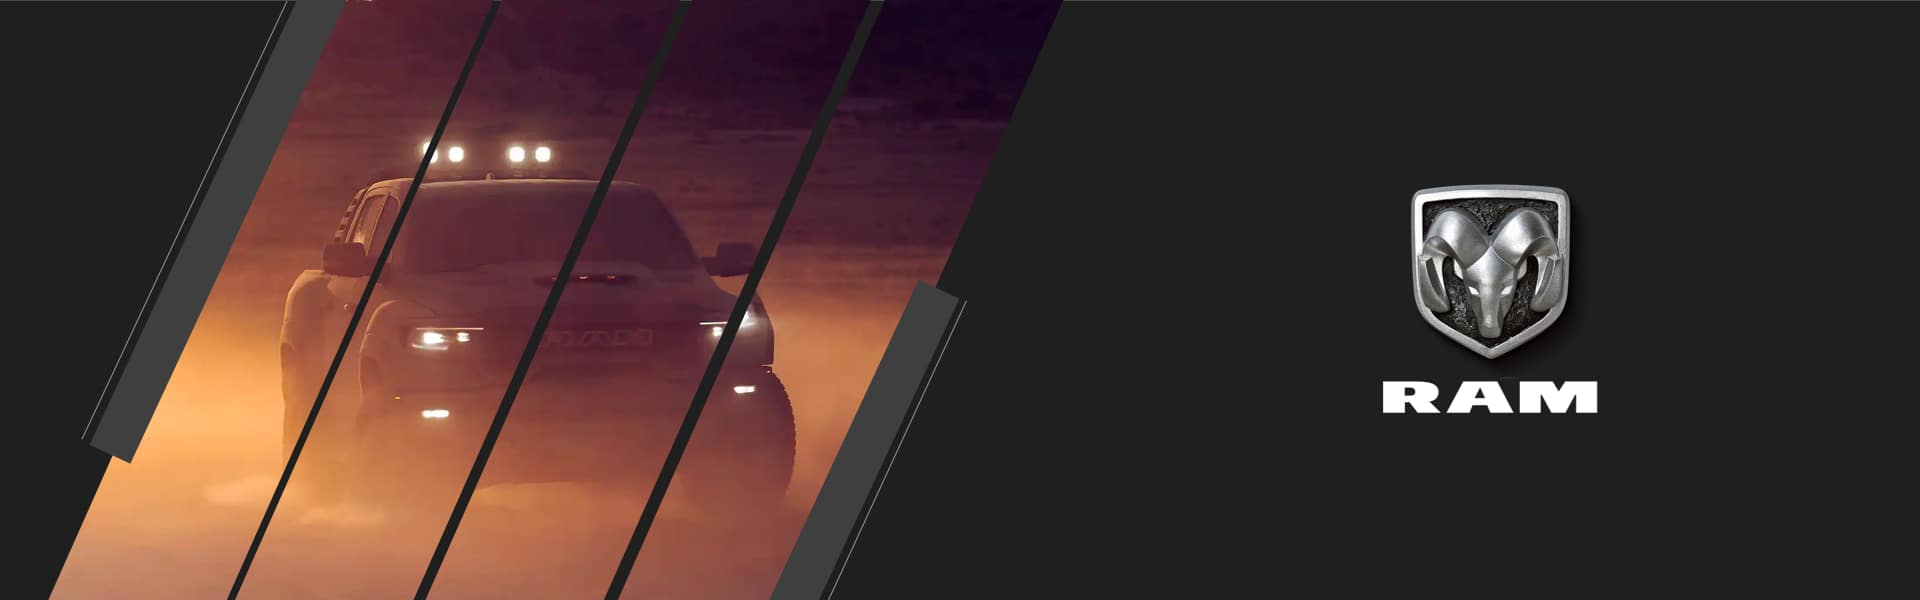 Desktop Jeep image